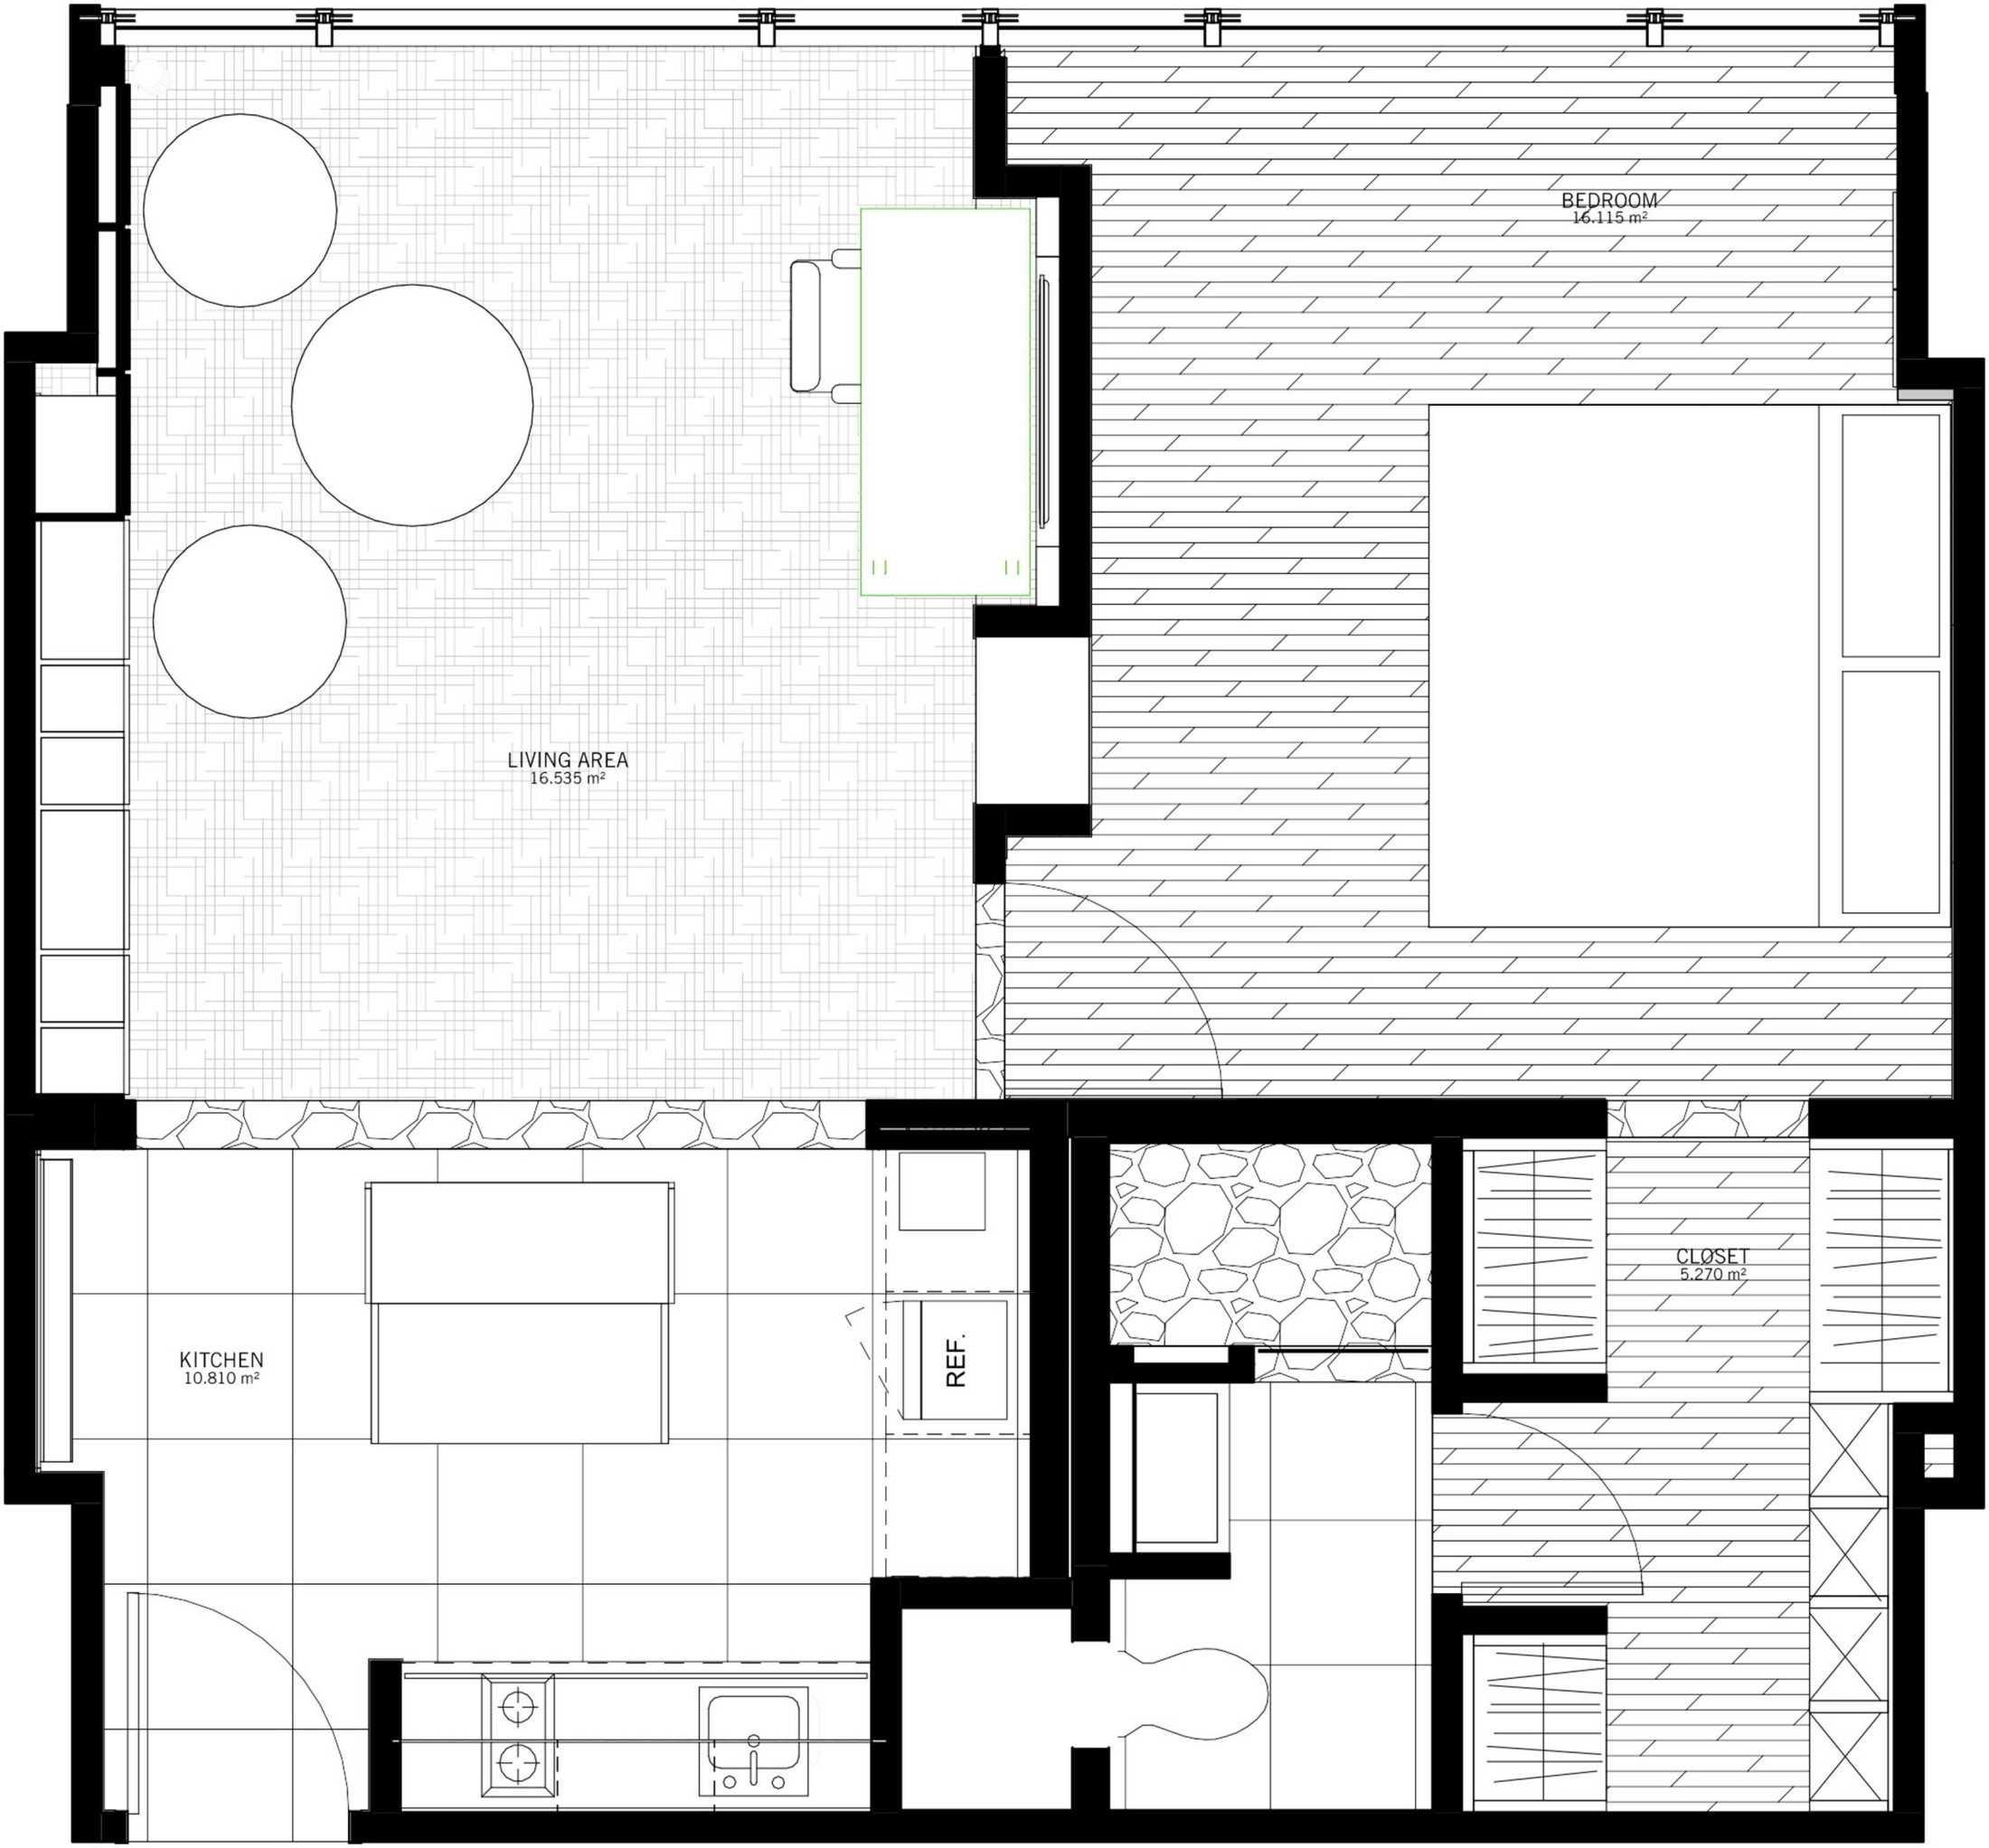 Jakarta Design Rush Apartment At Lippo Karawaci Lippo Karawaci, Binong, Kec. Curug, Tangerang, Banten, Indonesia Lippo Karawaci, Binong, Kec. Curug, Tangerang, Banten, Indonesia Jakarta-Design-Rush-Apartment-At-Lippo-Karawaci  90871